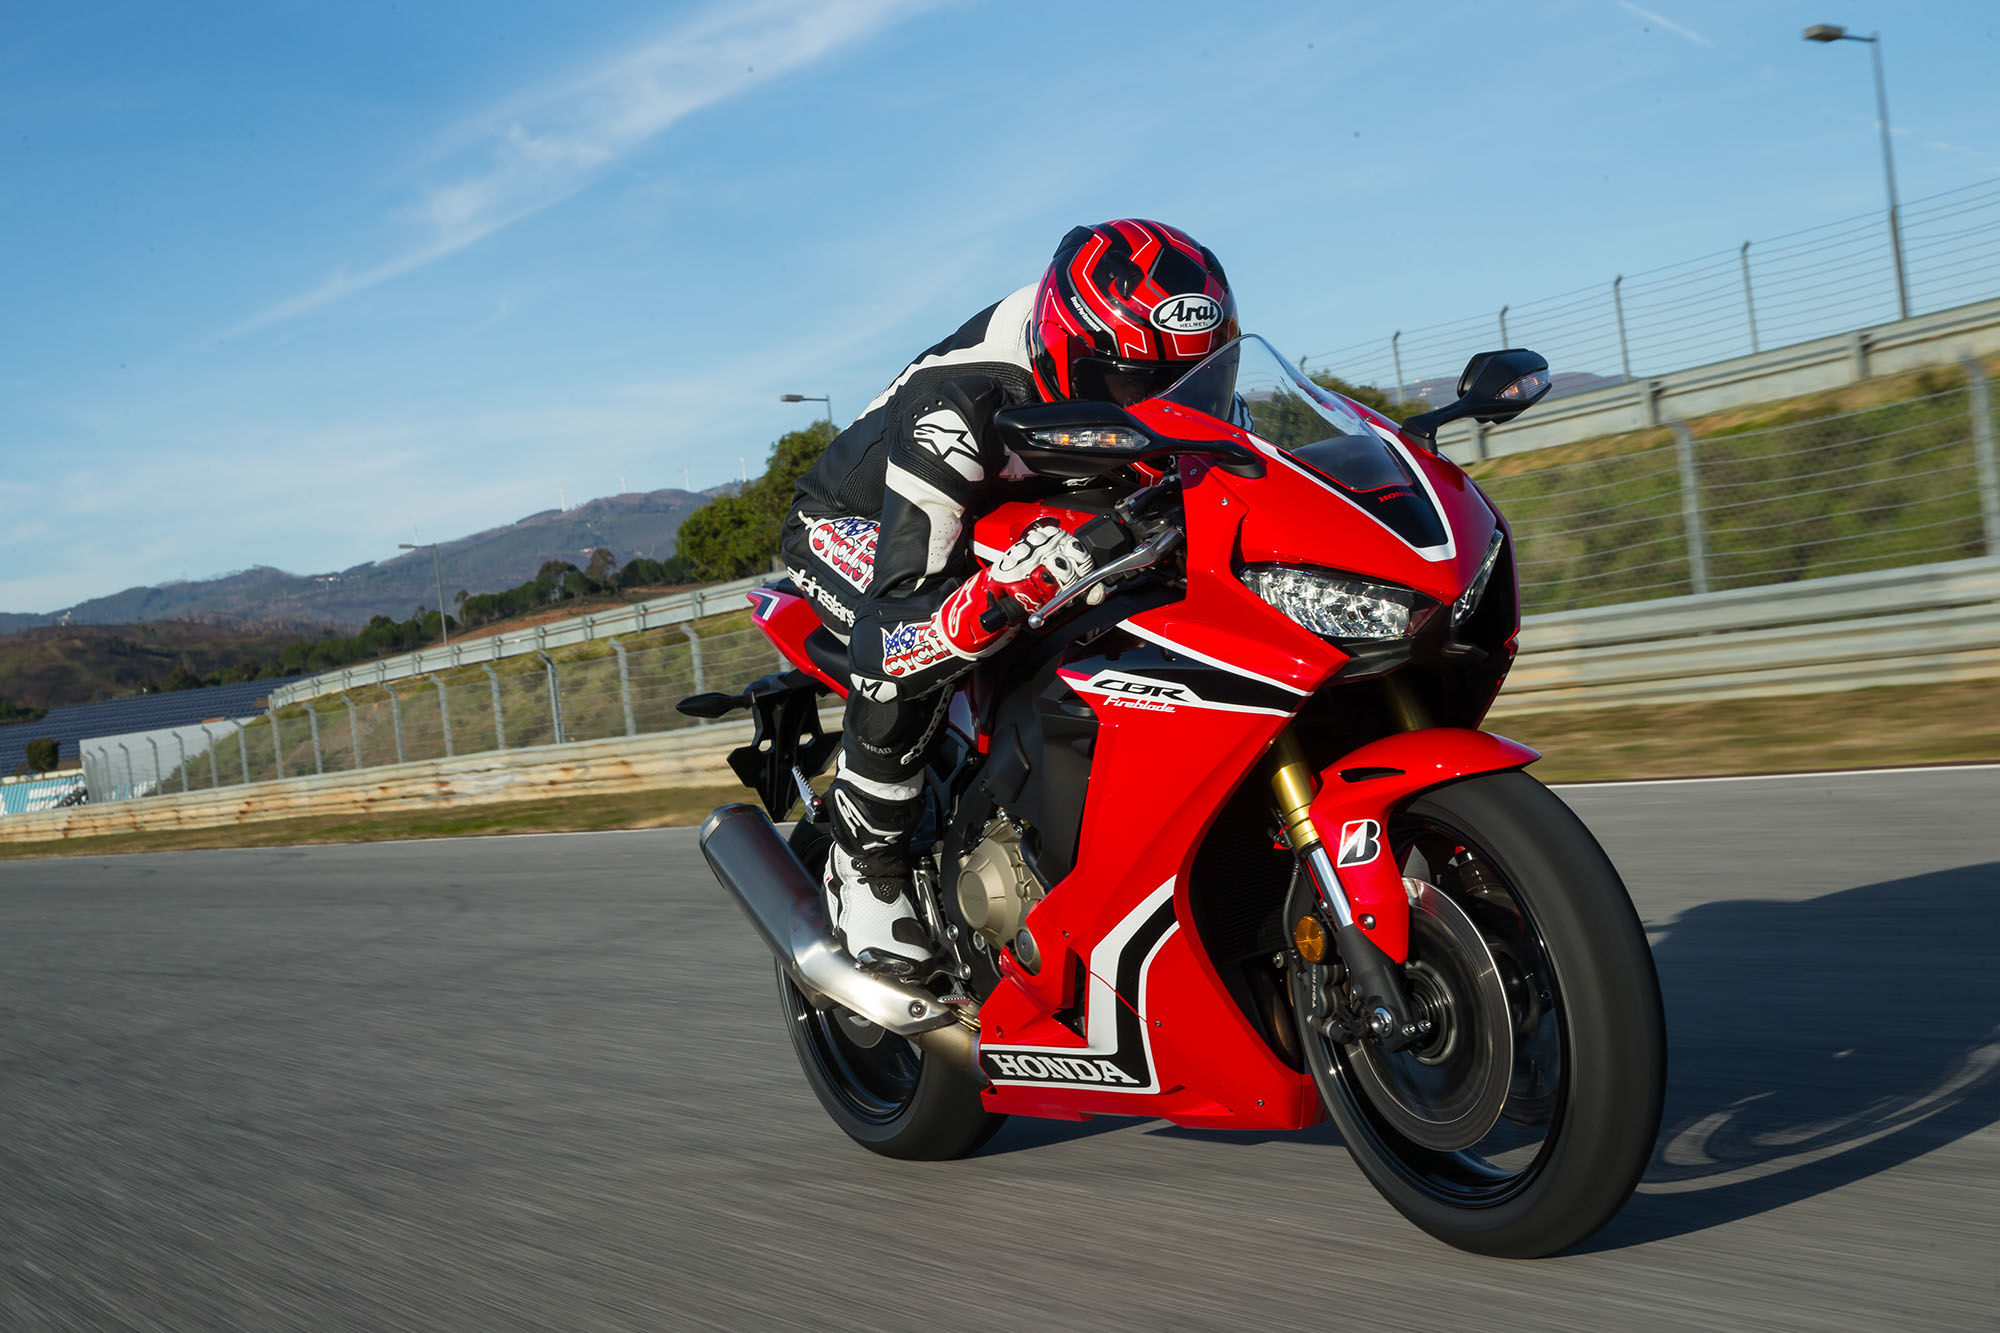 Honda Cbr1000rr Review >> The New Honda CBR 1000 RR Review Super Bike is Here